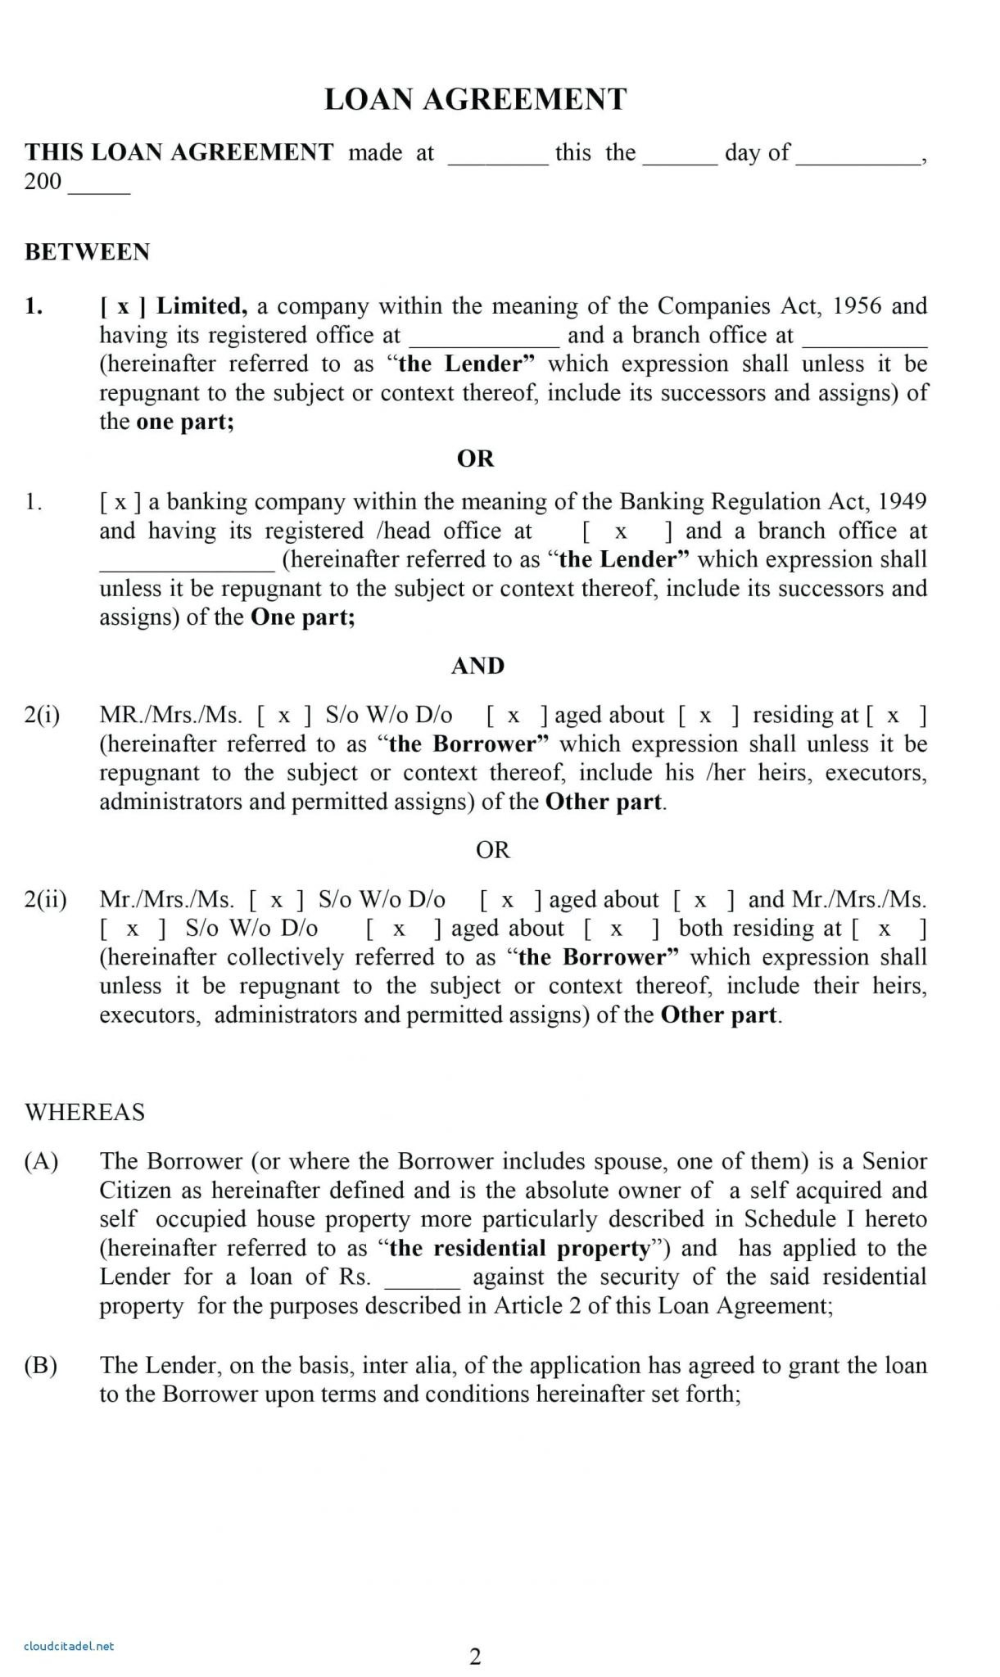 Sample Letter Requesting Sales Tax Exemption Certificate Lera Mera